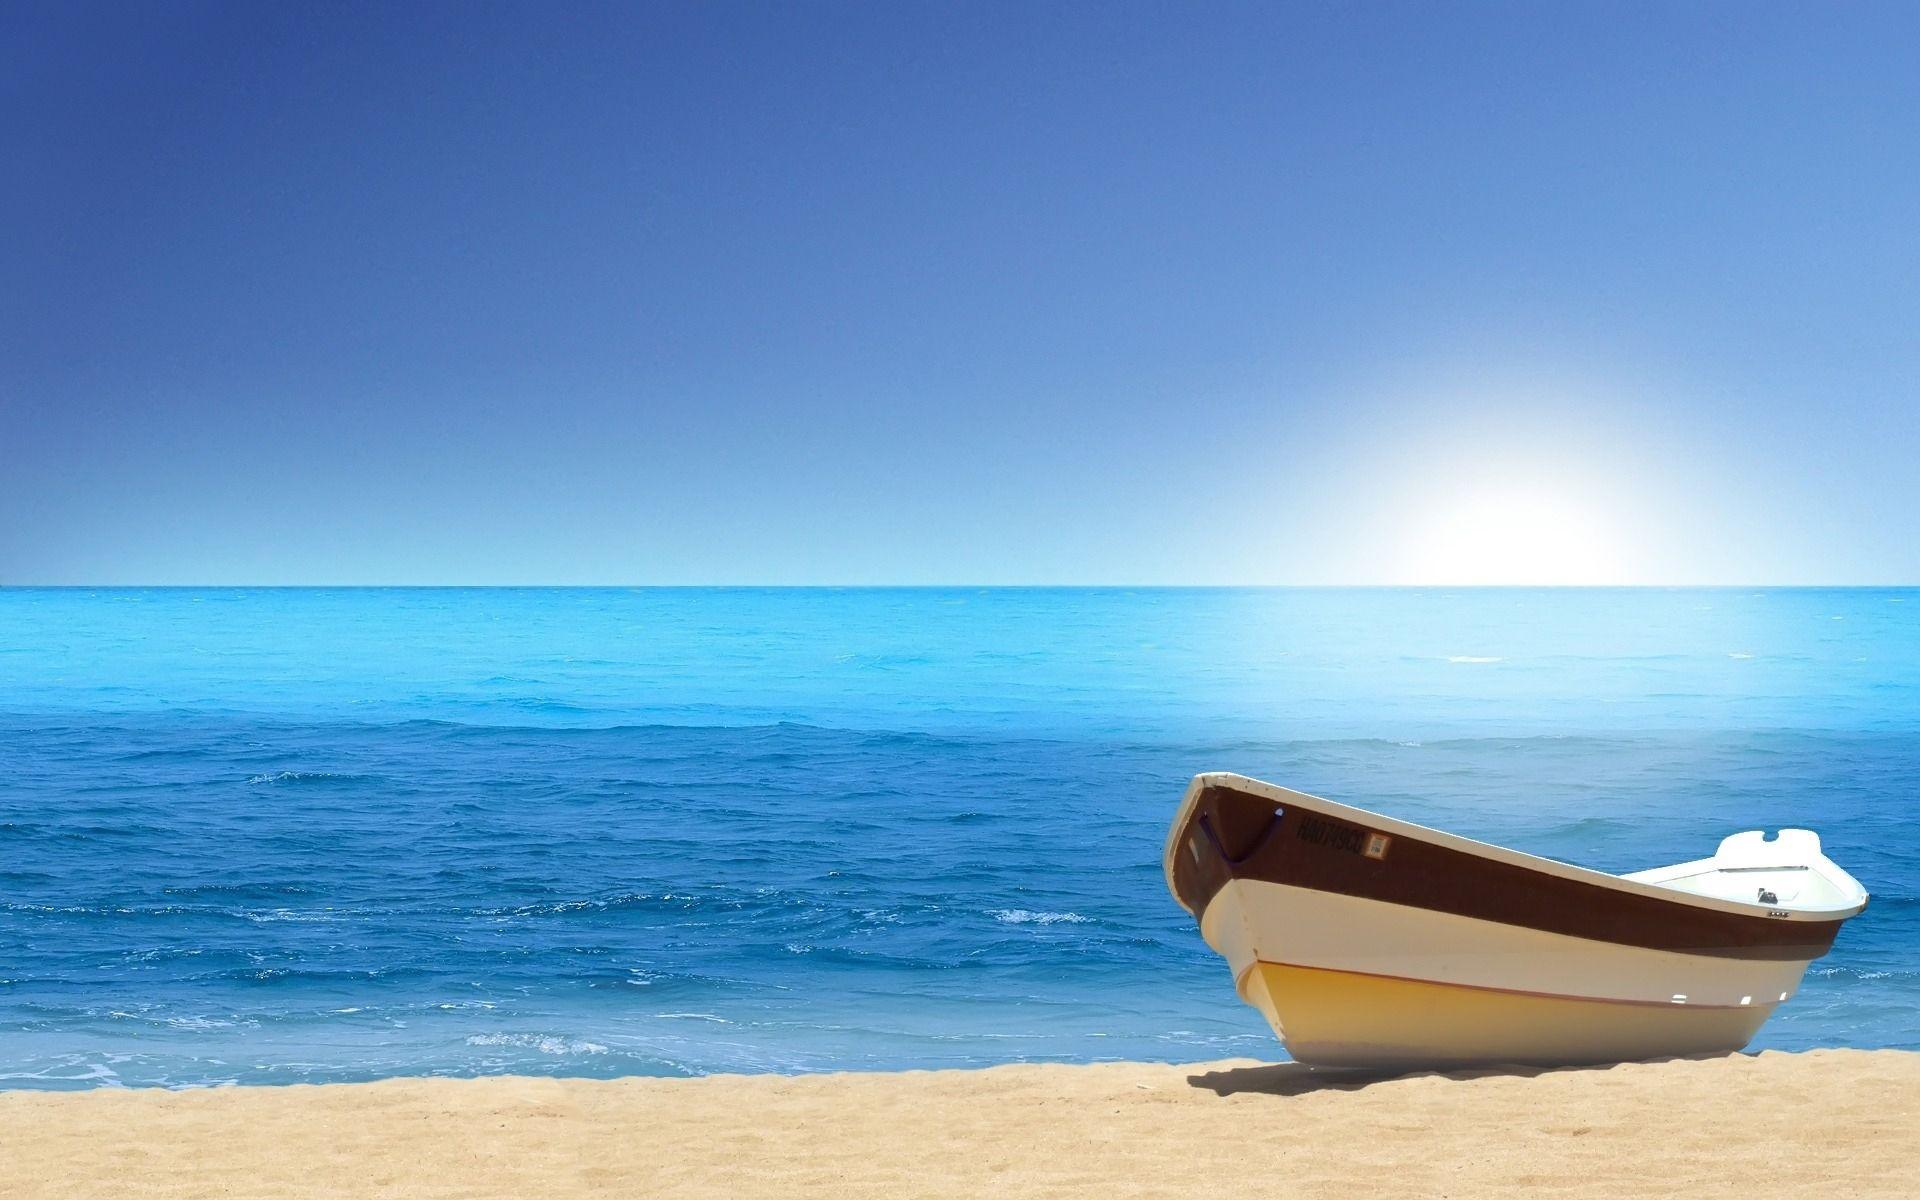 rowing boats - google search | art | pinterest | hd wallpaper